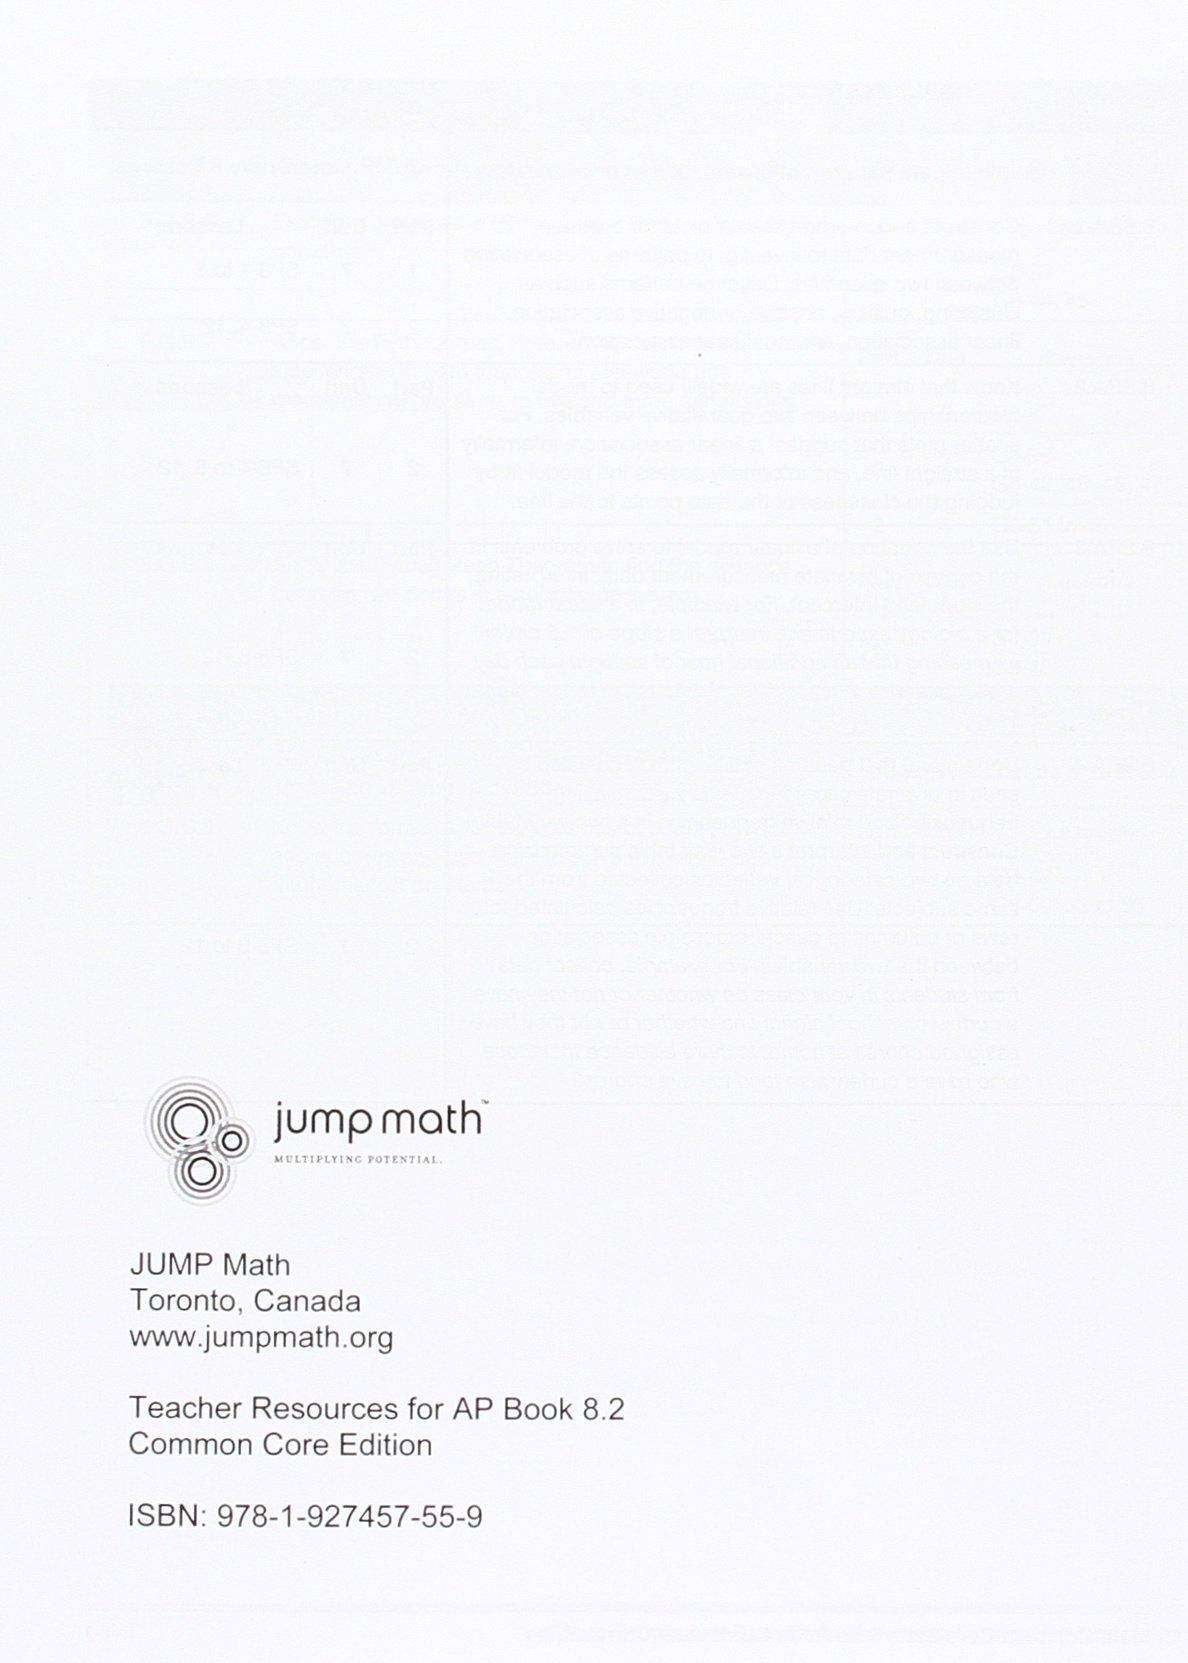 Amazon.com: JUMP Math CC Teacher Resource 8.2: Common Core Edition  (9781927457559): John Mighton: Books